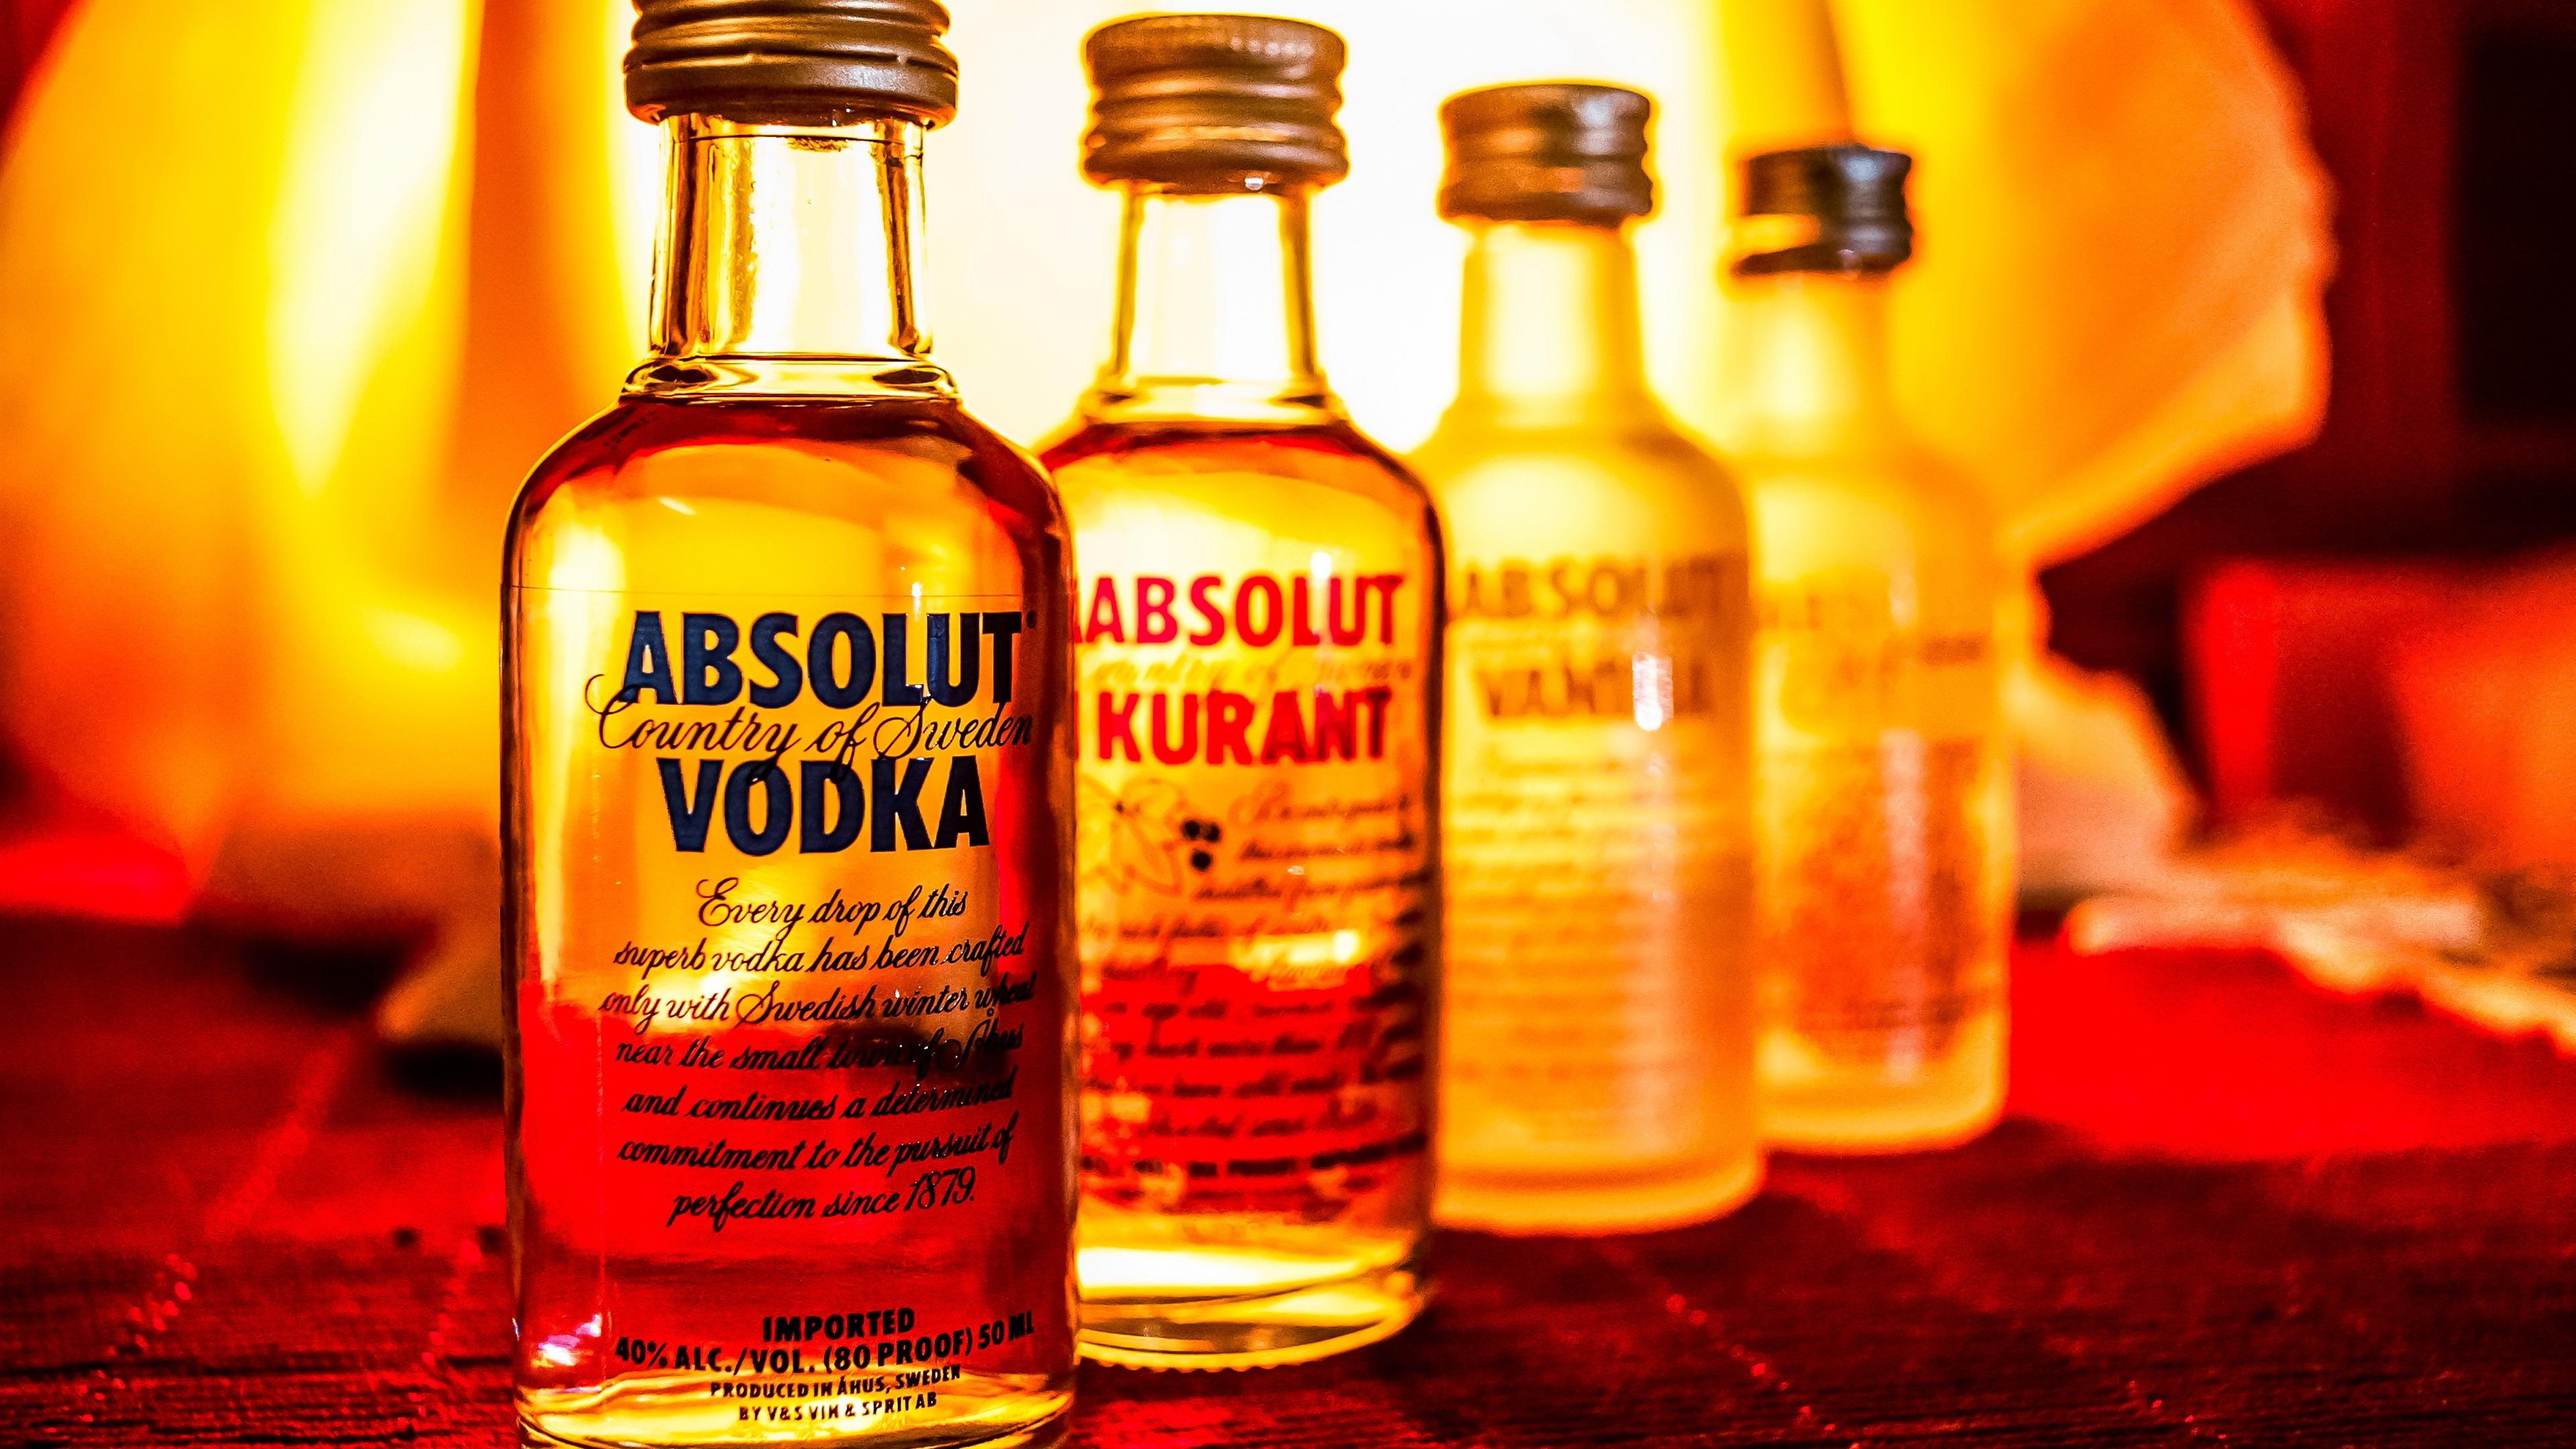 Fondos de pantalla Absolut Vodka, licor, botellas 3840x2160 UHD 4K Imagen